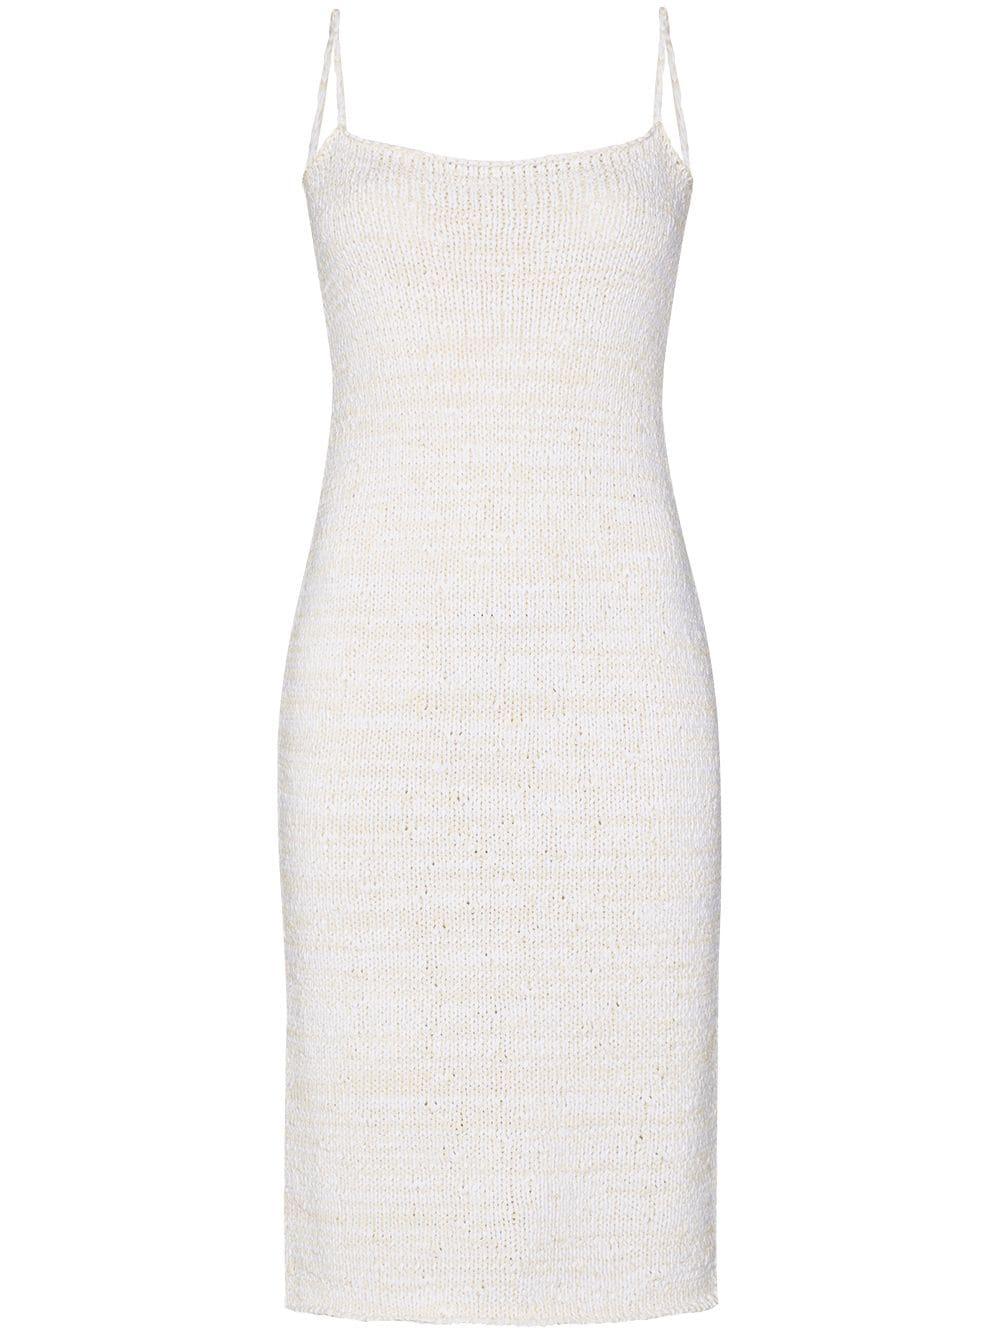 Bílé úpletové šaty, BOTTEGA VENETA